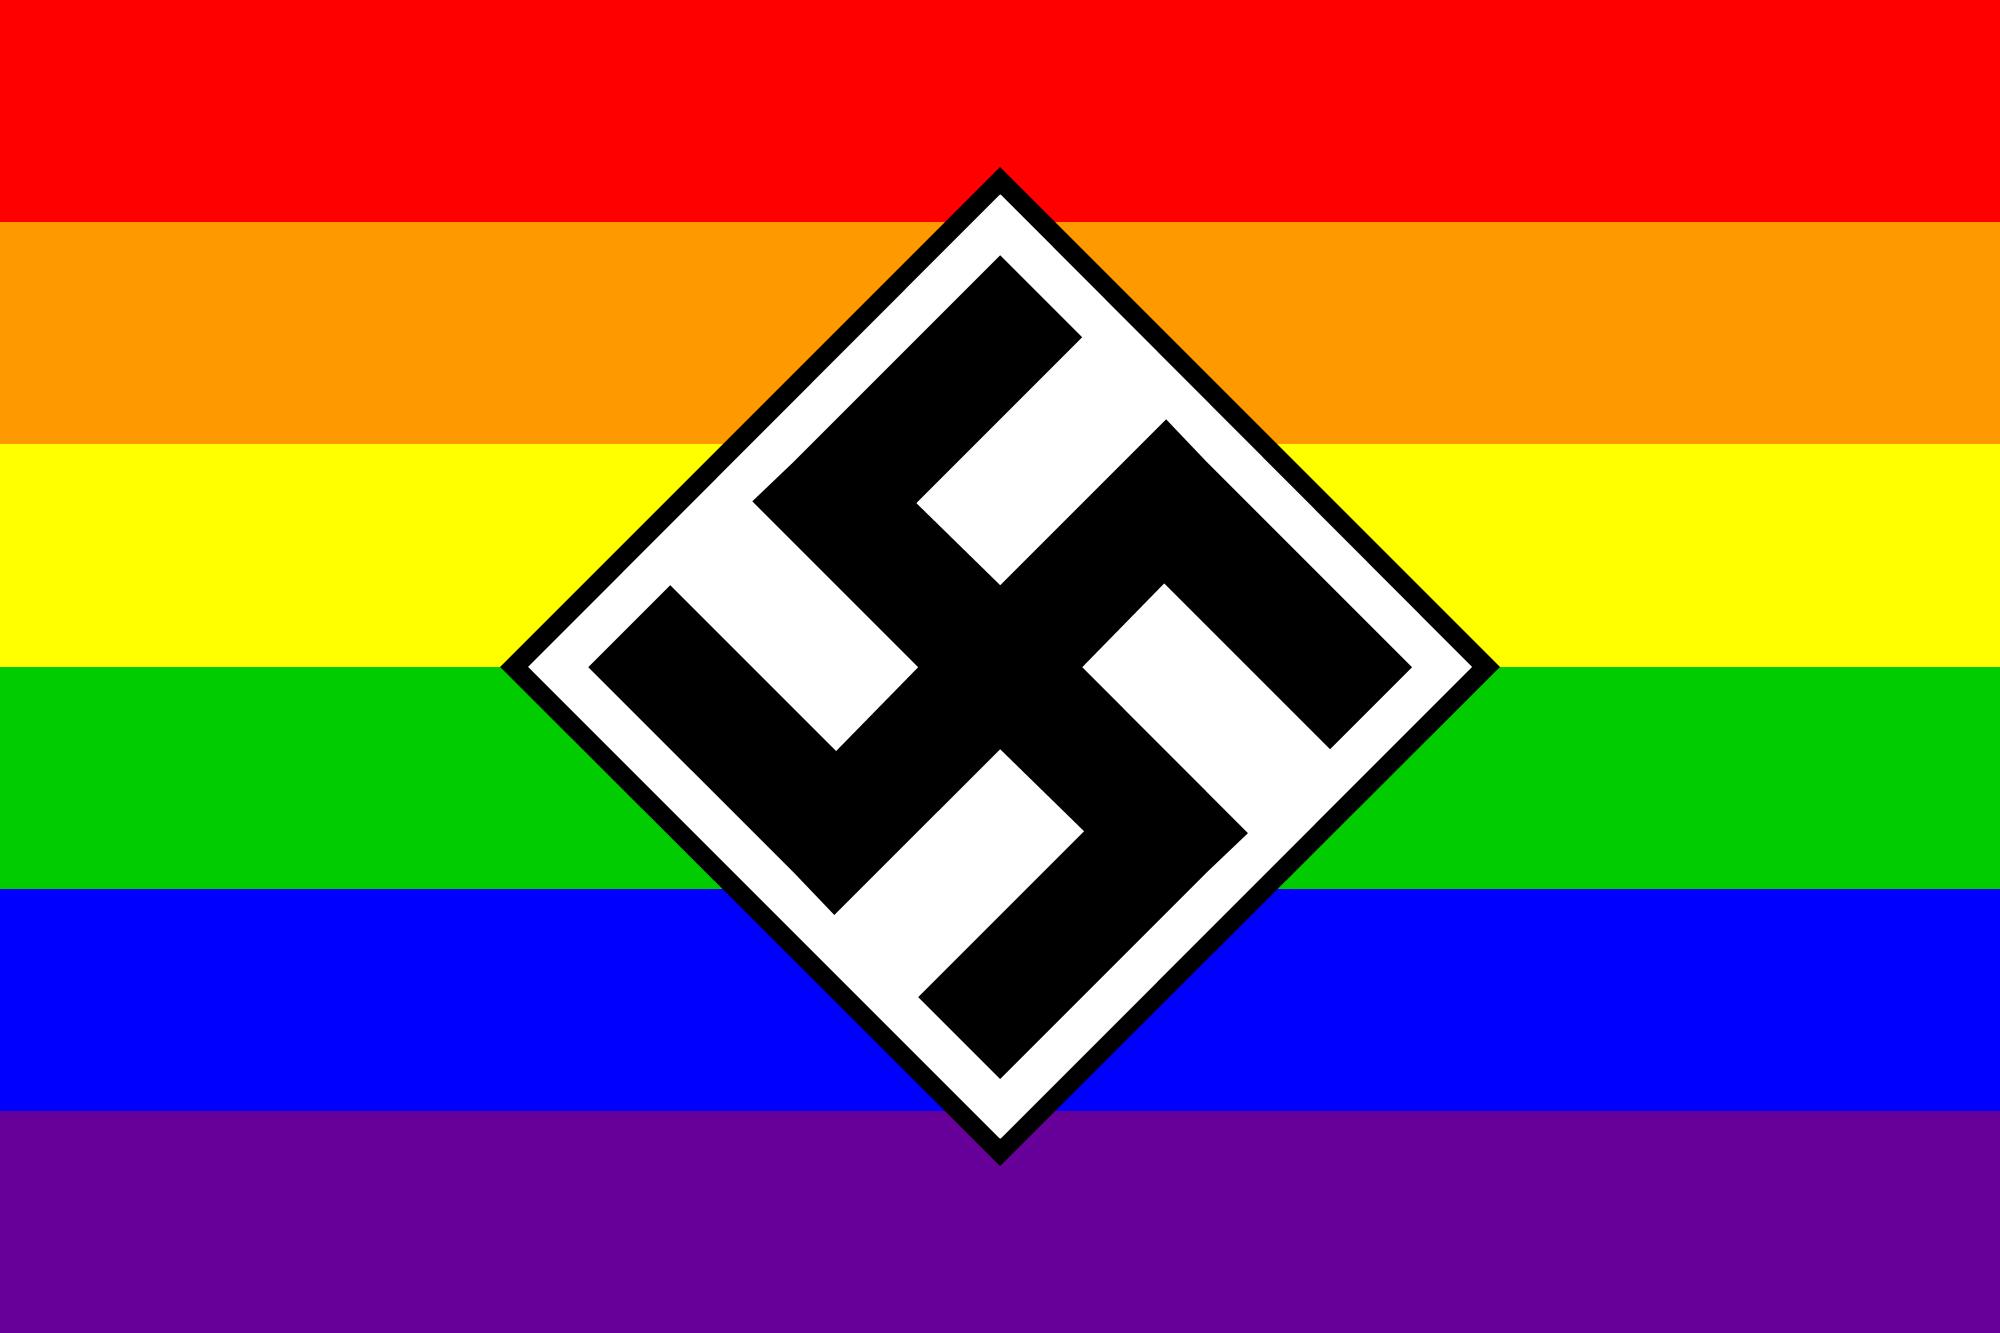 https://cdn.discordapp.com/attachments/489003669493121031/489996048853368832/gays4natsoclarge.png